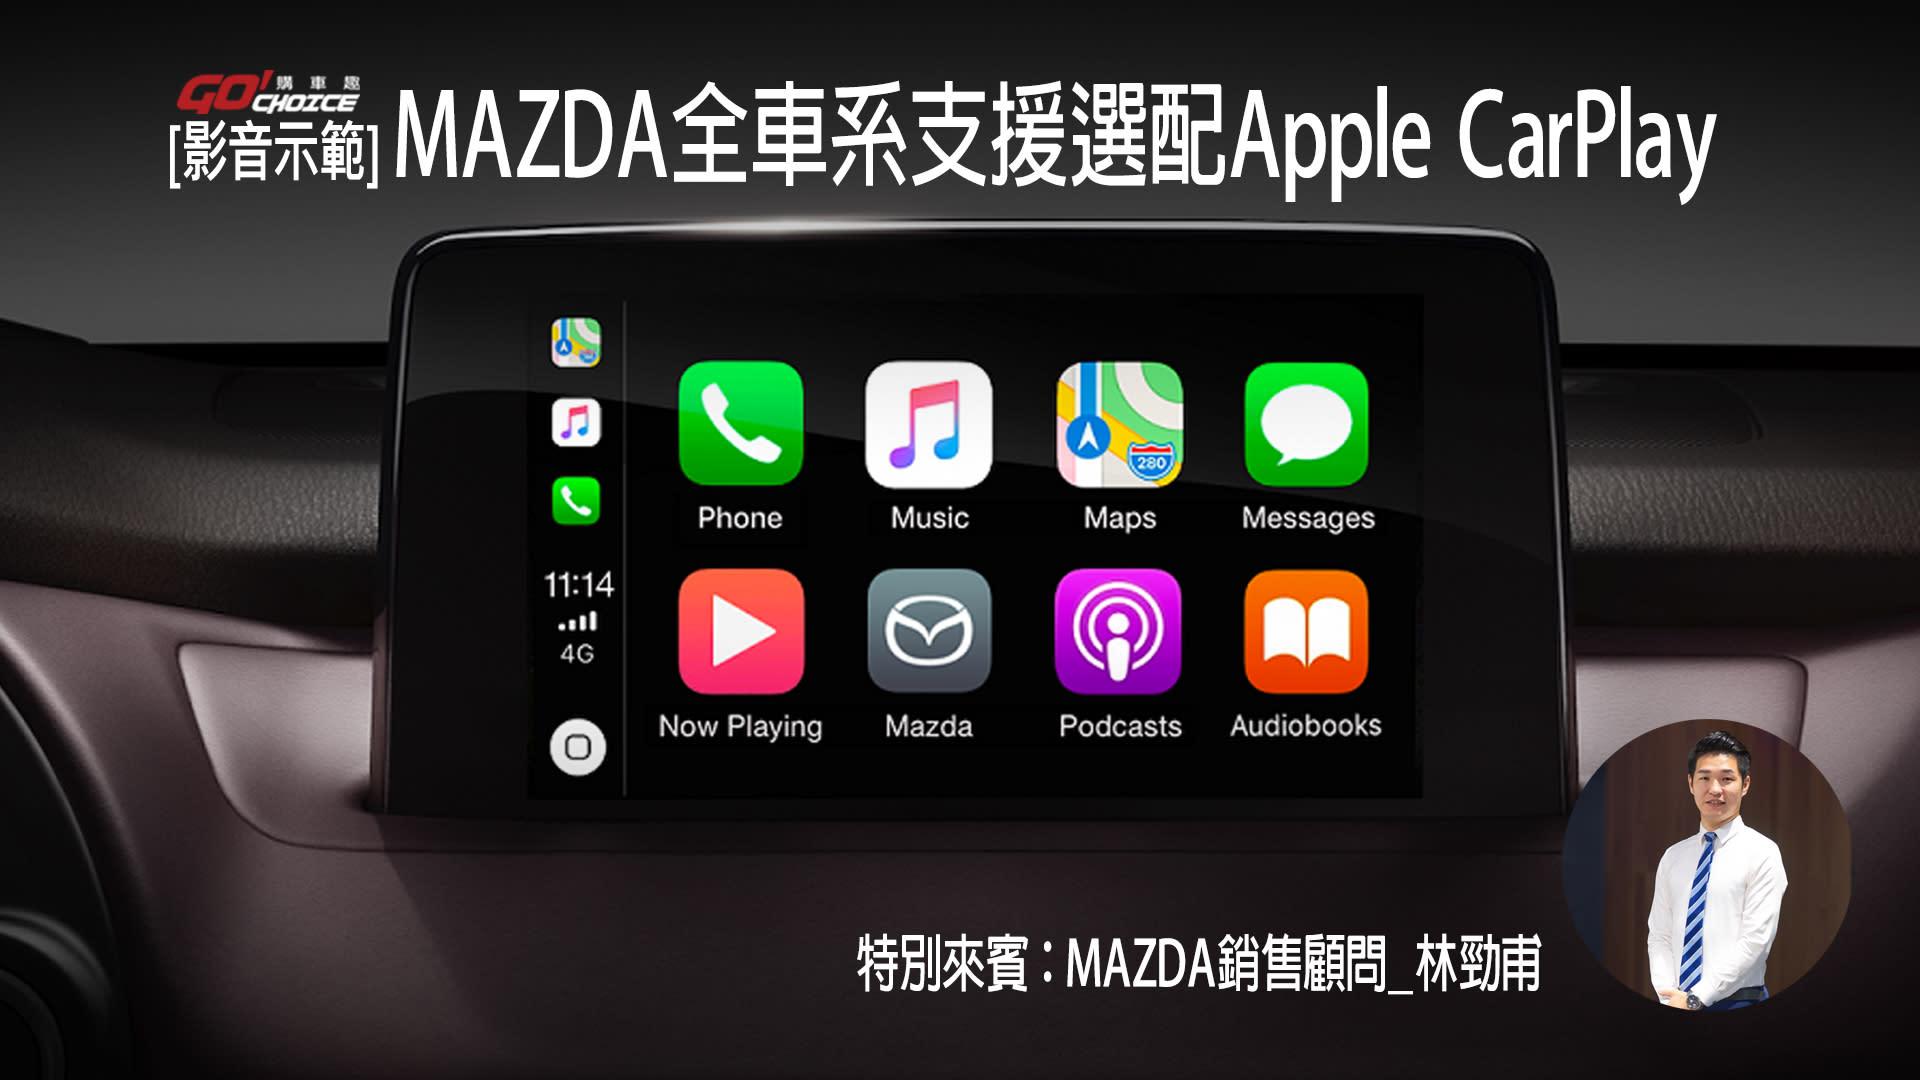 MAZDA全車系支援選配Apple CarPlay-操作示範影片(MAZDA銷售顧問_林勁甫)